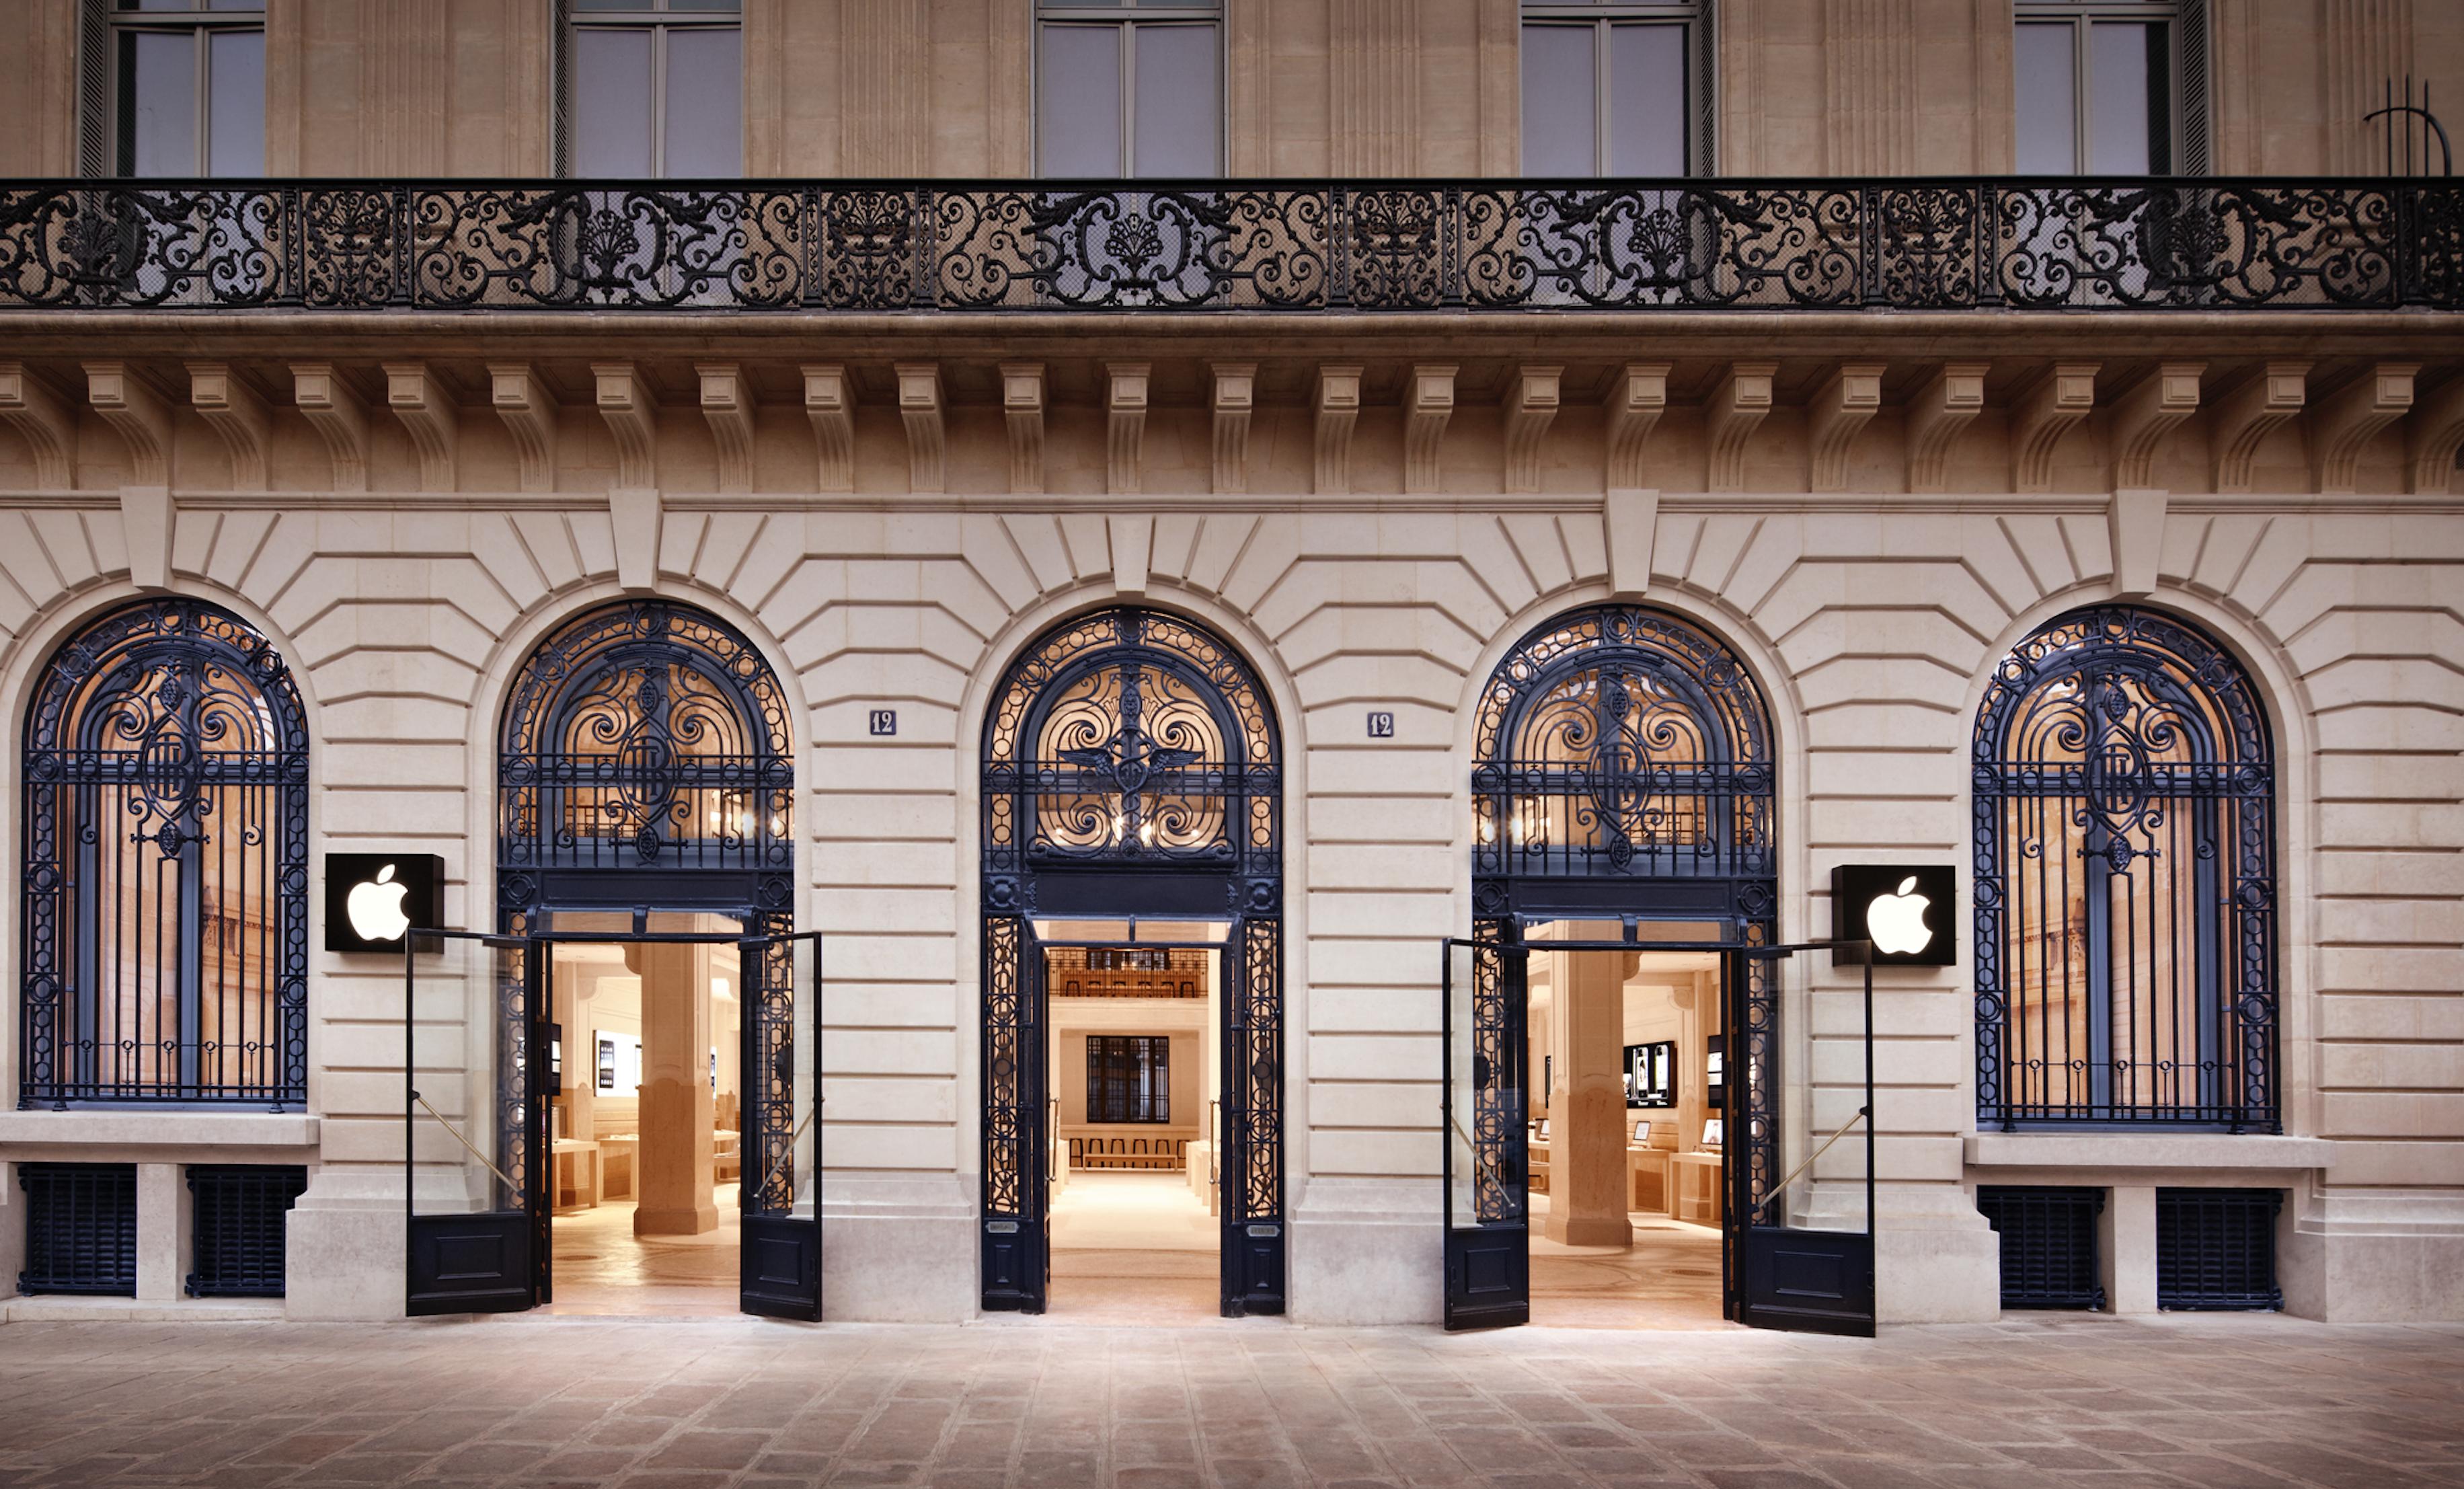 Apple storefront in Paris with black Apple logo in window display.